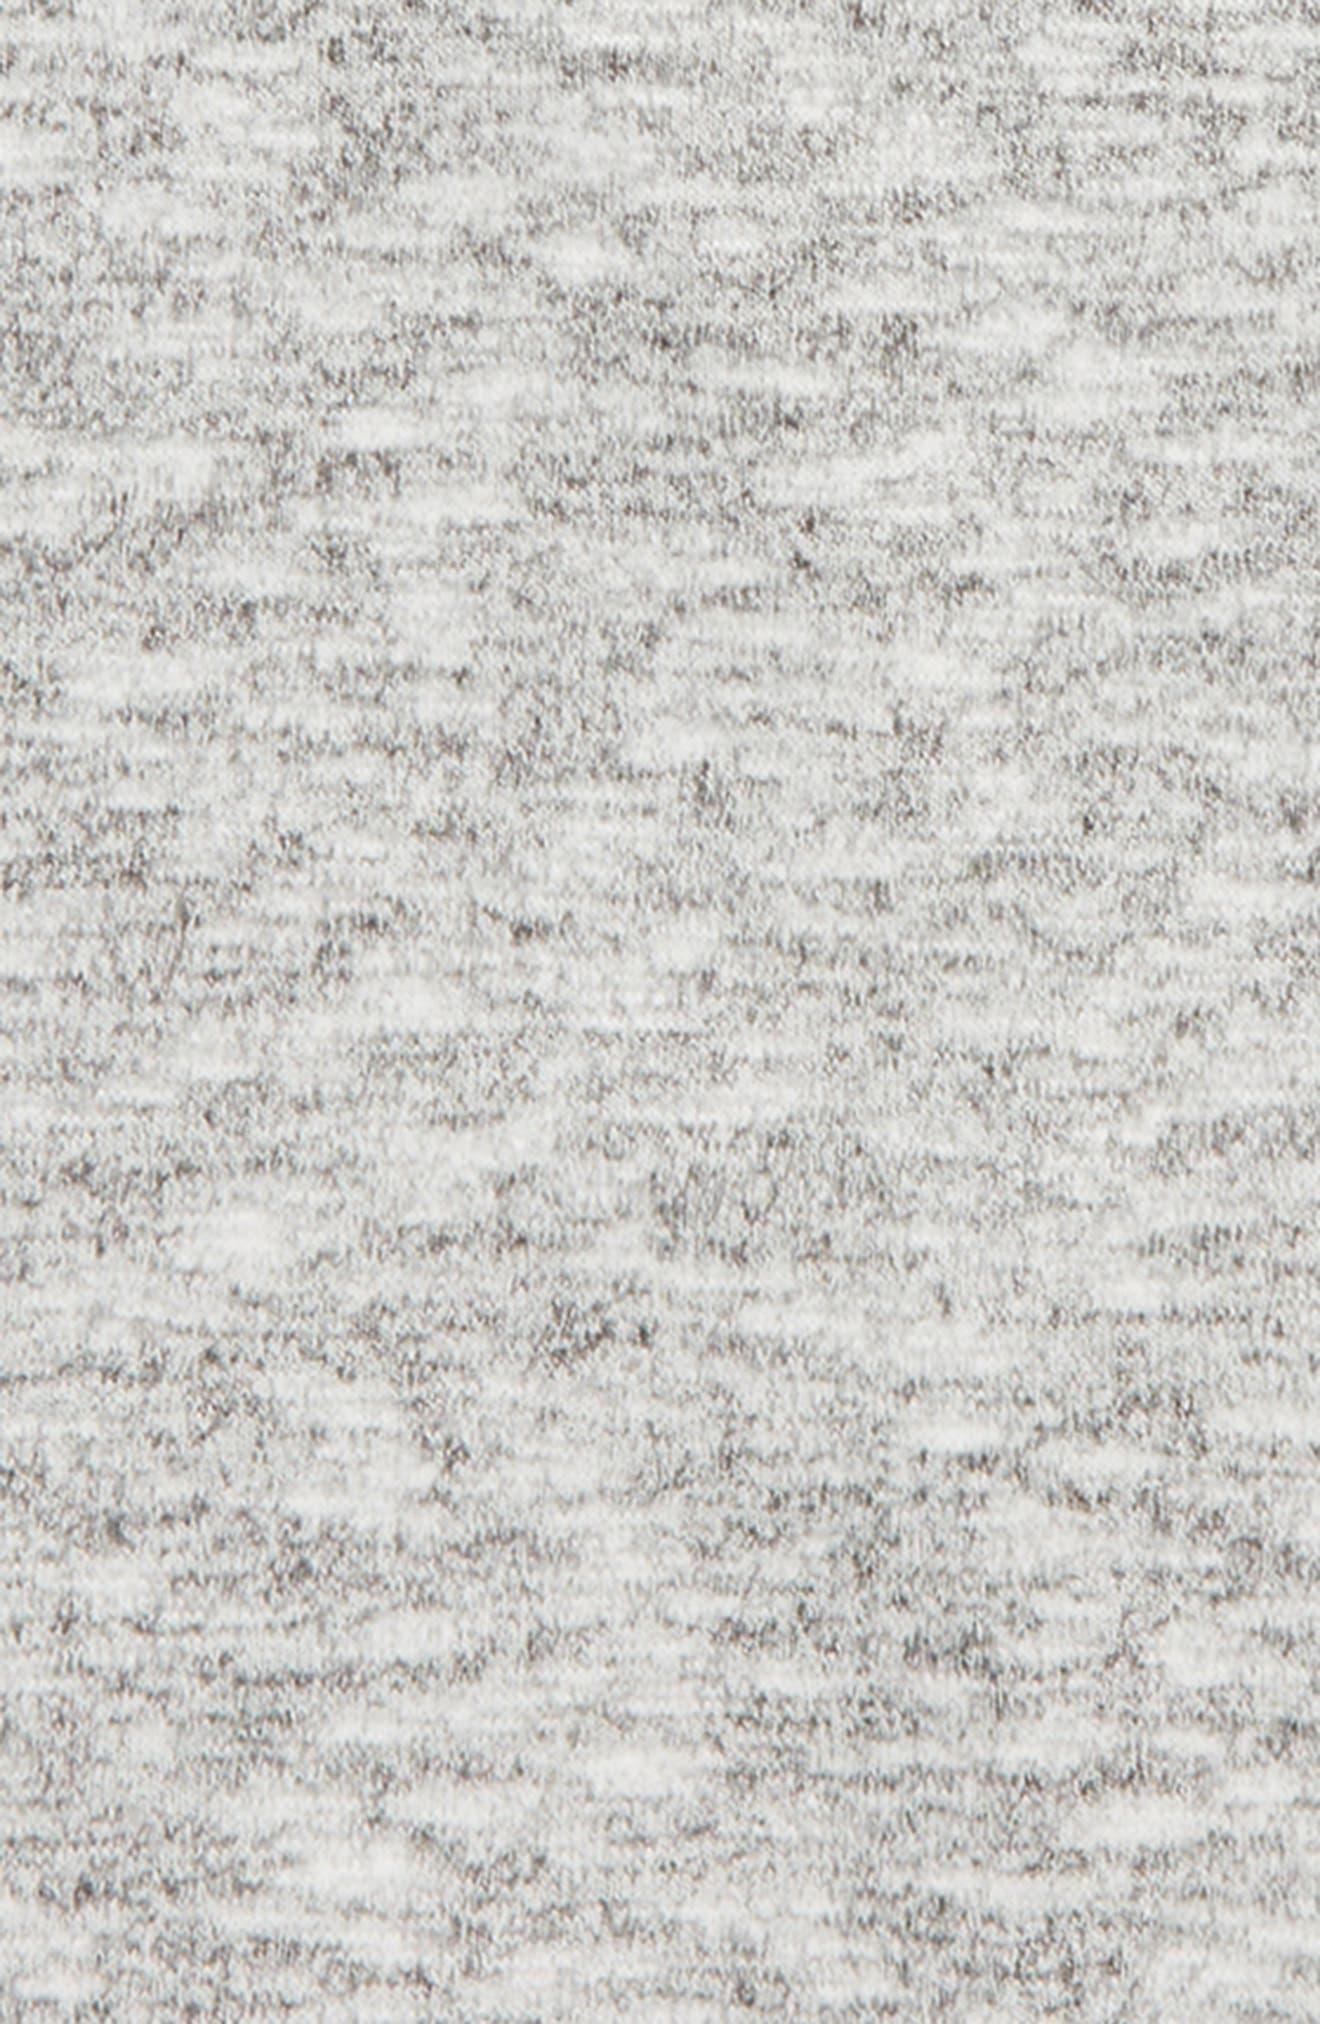 Zella Open Back Sweater,                             Alternate thumbnail 3, color,                             Black- White